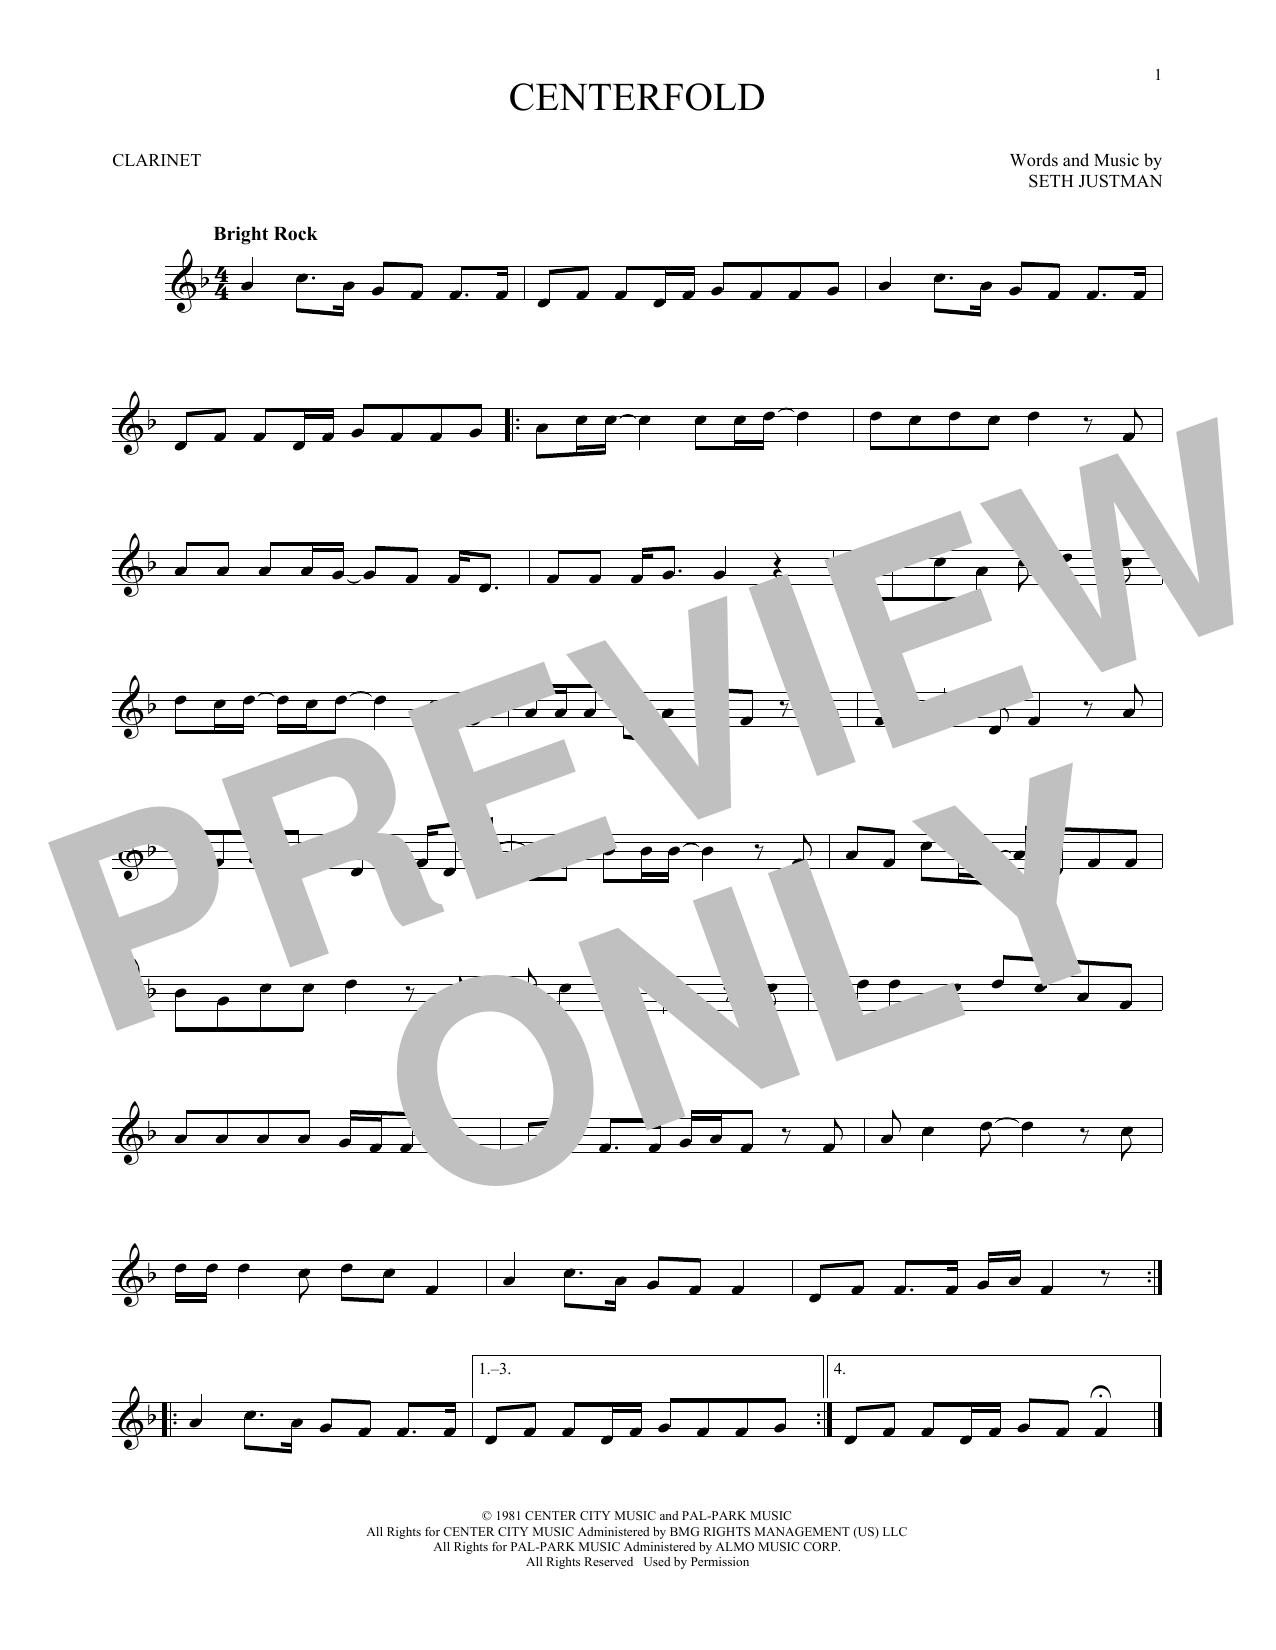 Centerfold (Clarinet Solo)